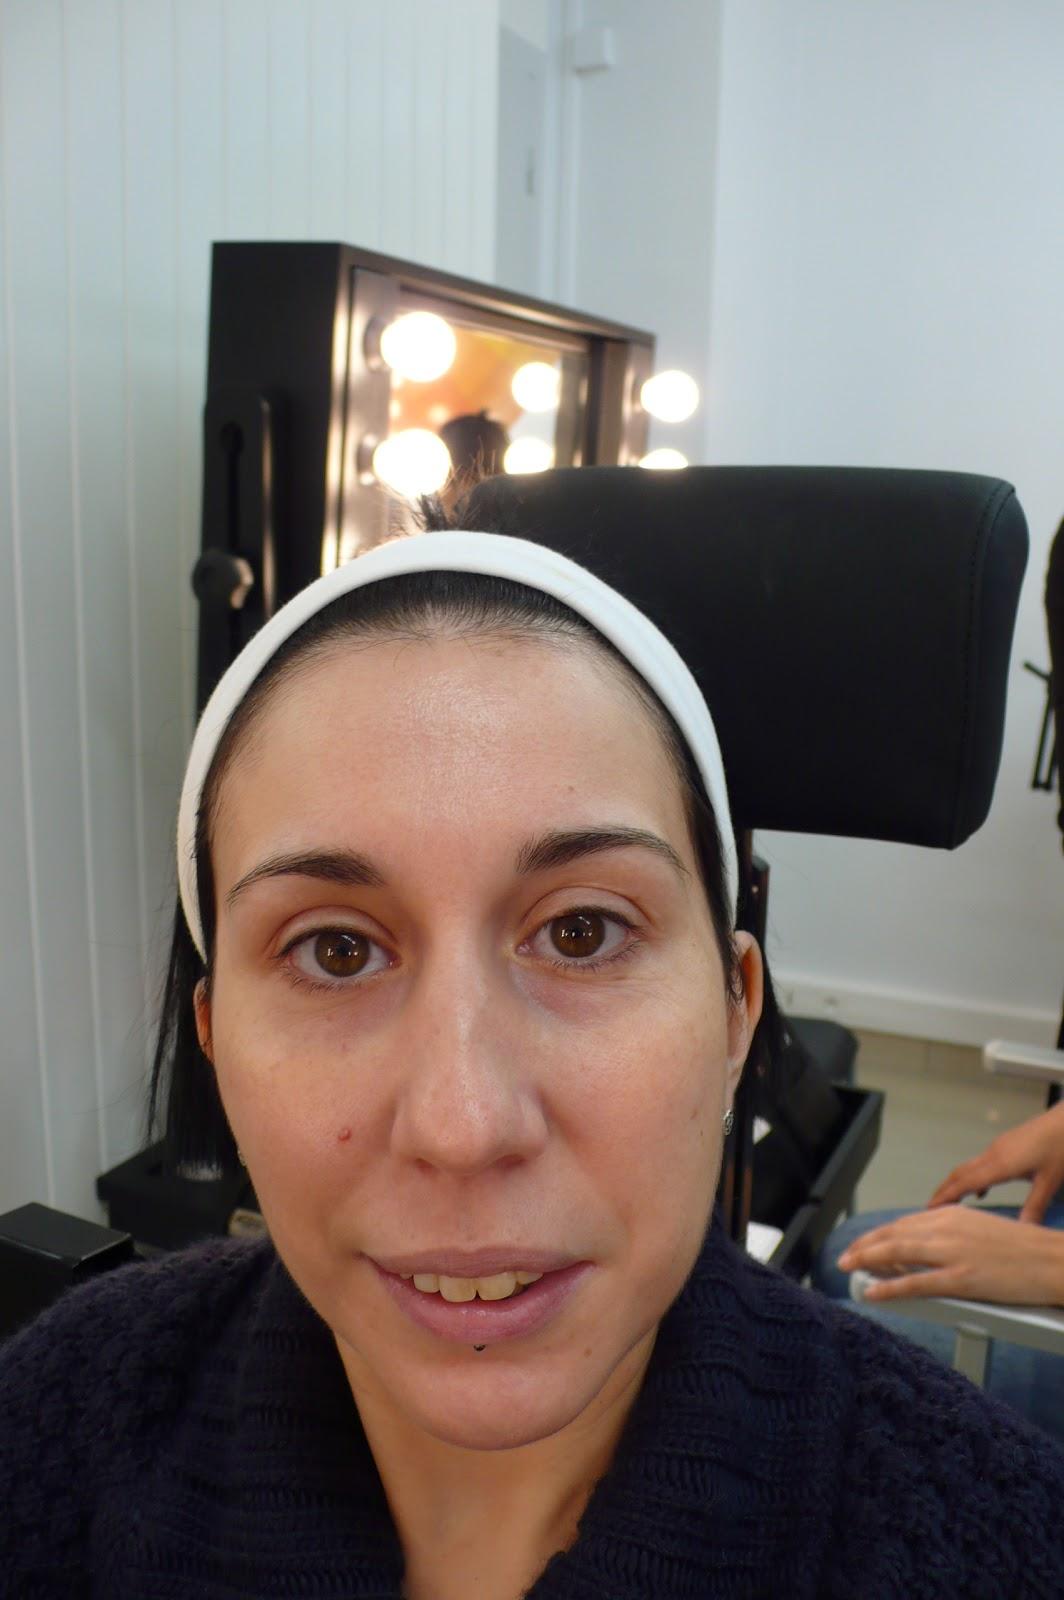 Ma vie en beaut maquillage sophistiqu - Maquillage annee 20 ...